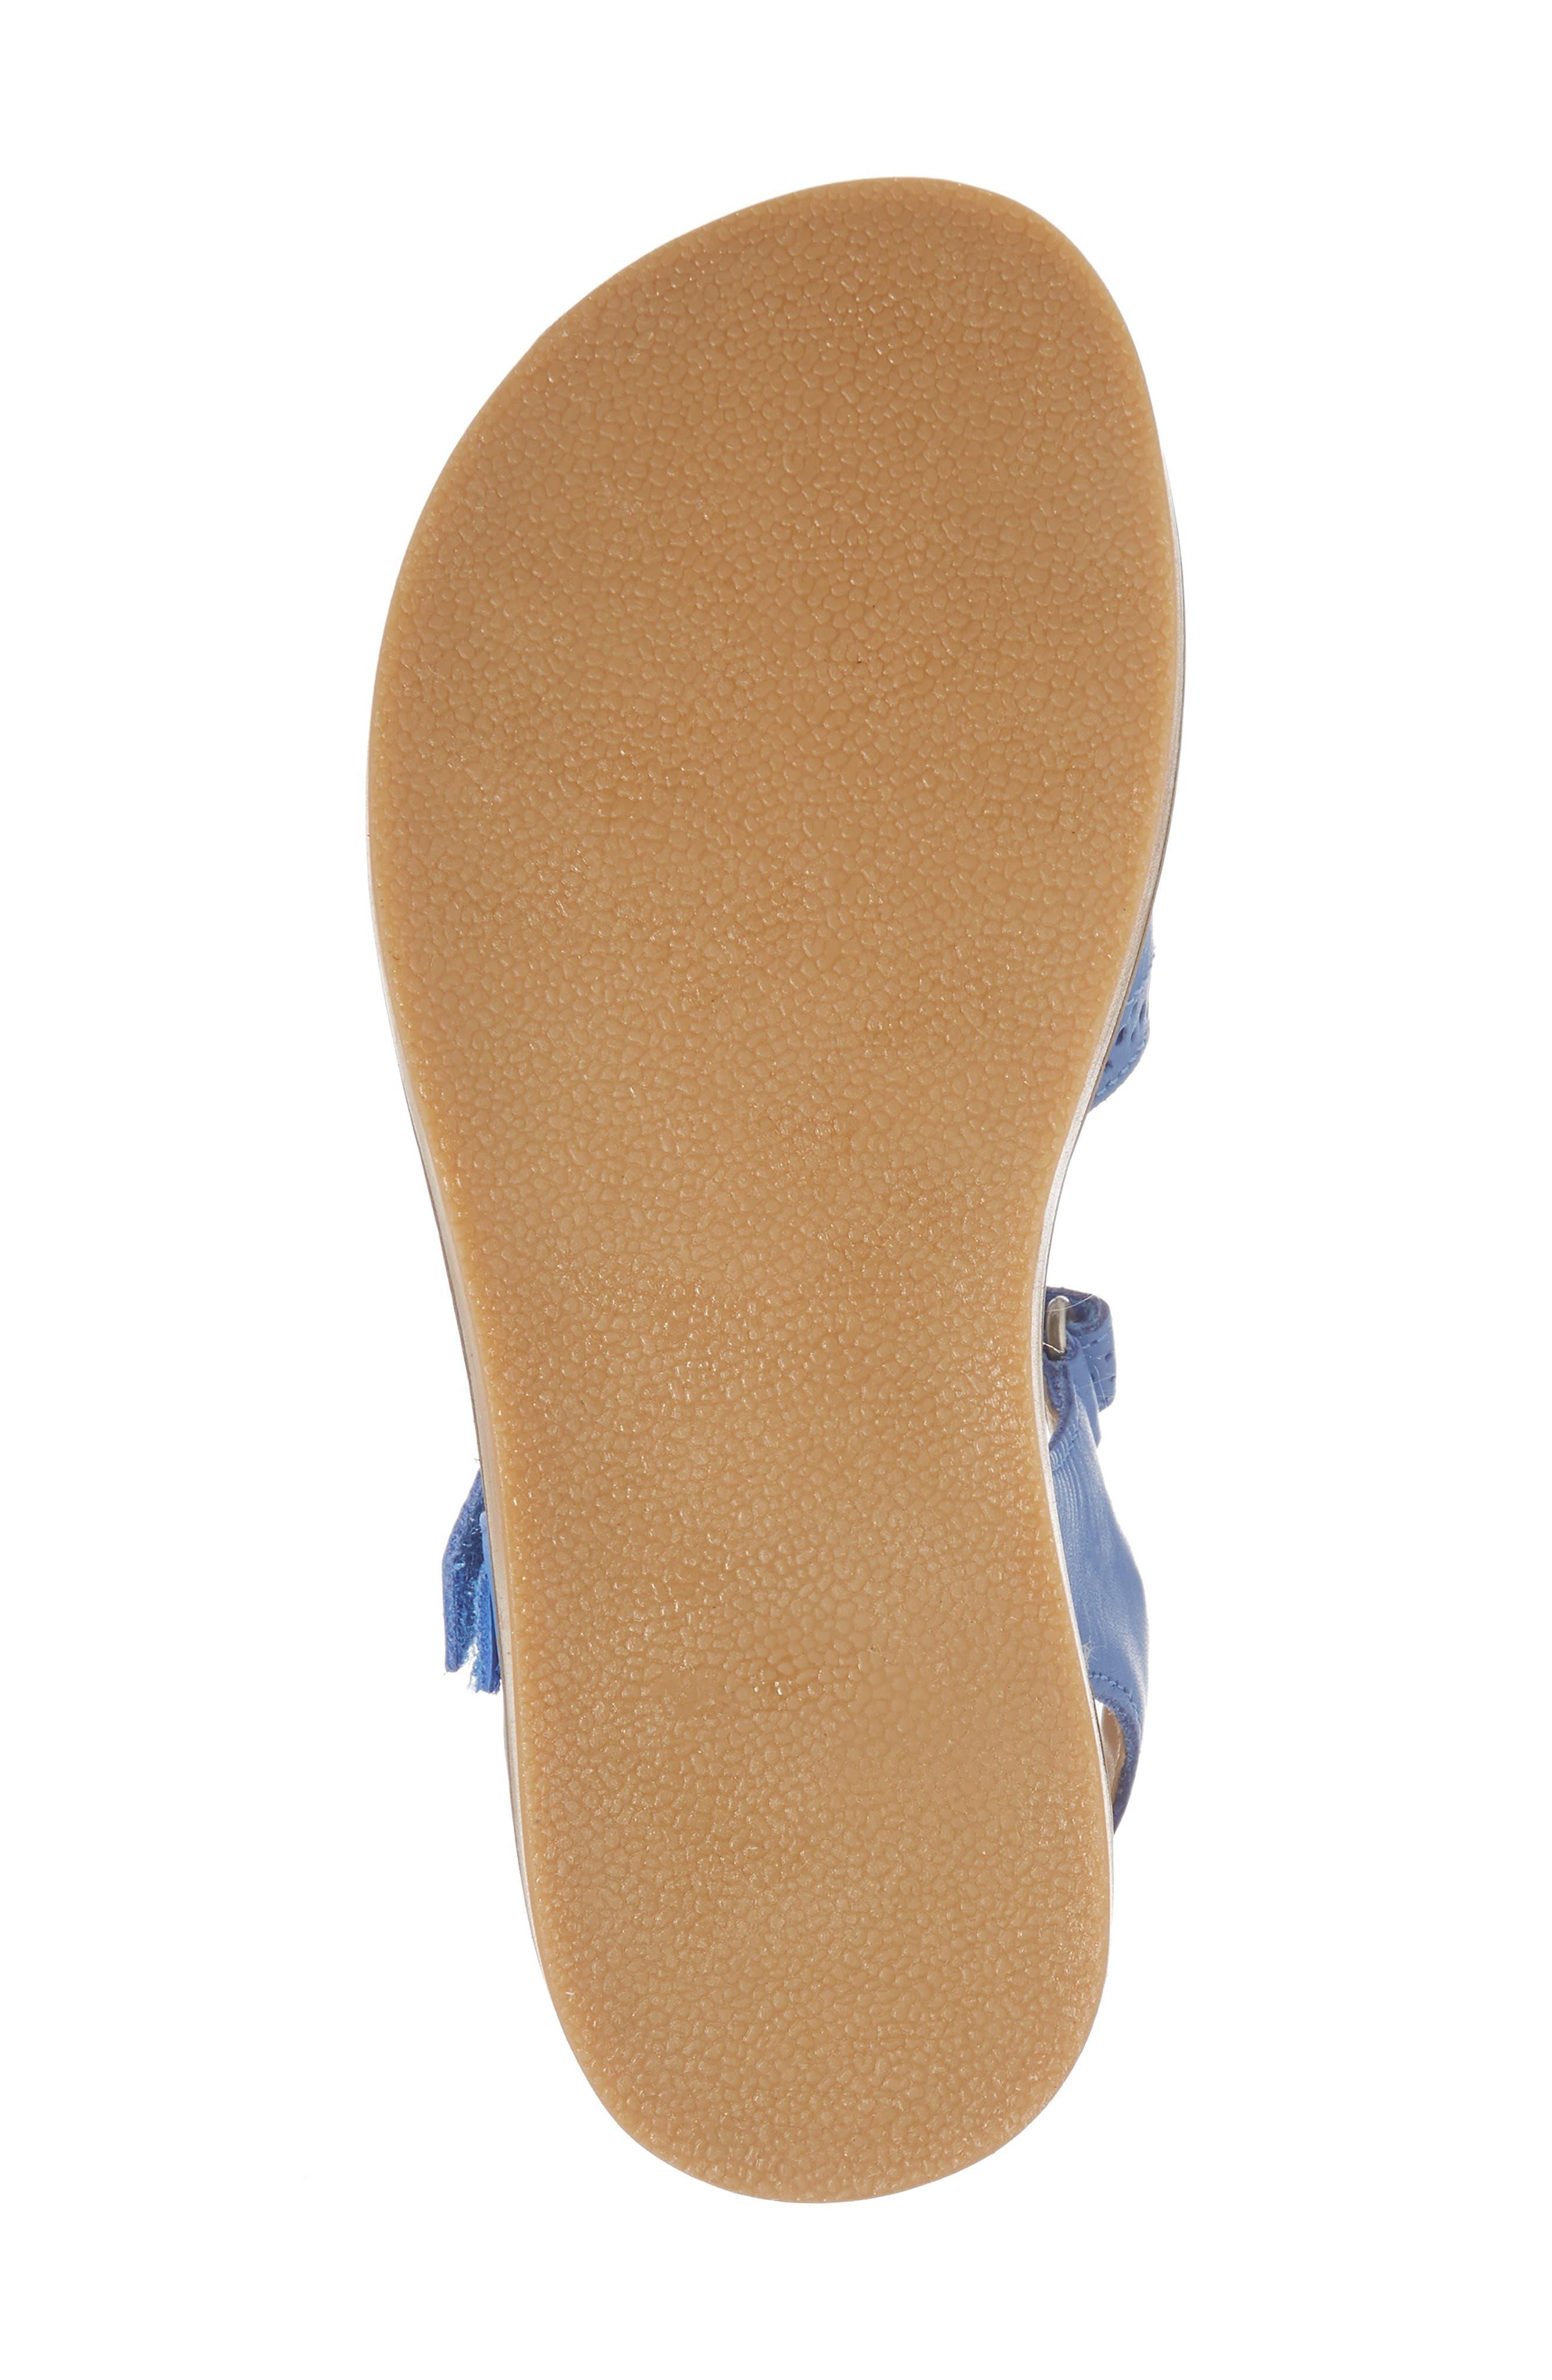 Adjustable Quarter Strap Sandal,                             Alternate thumbnail 6, color,                             424